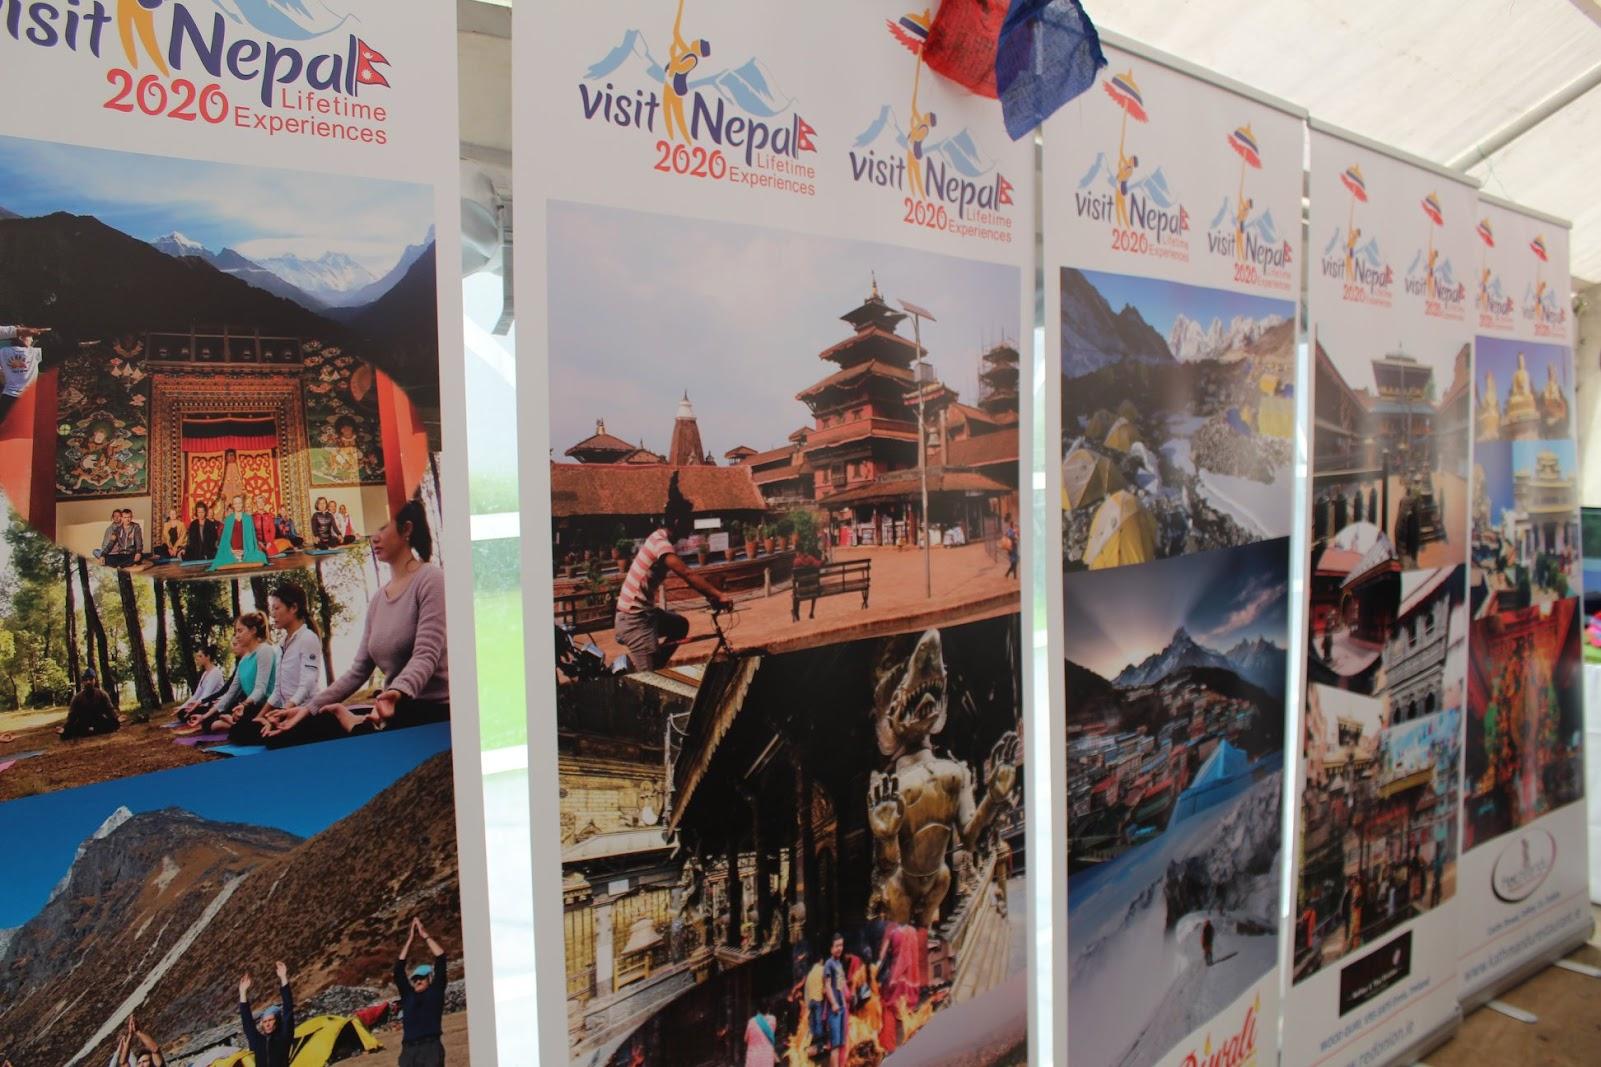 Nepal Ireland Day 2019